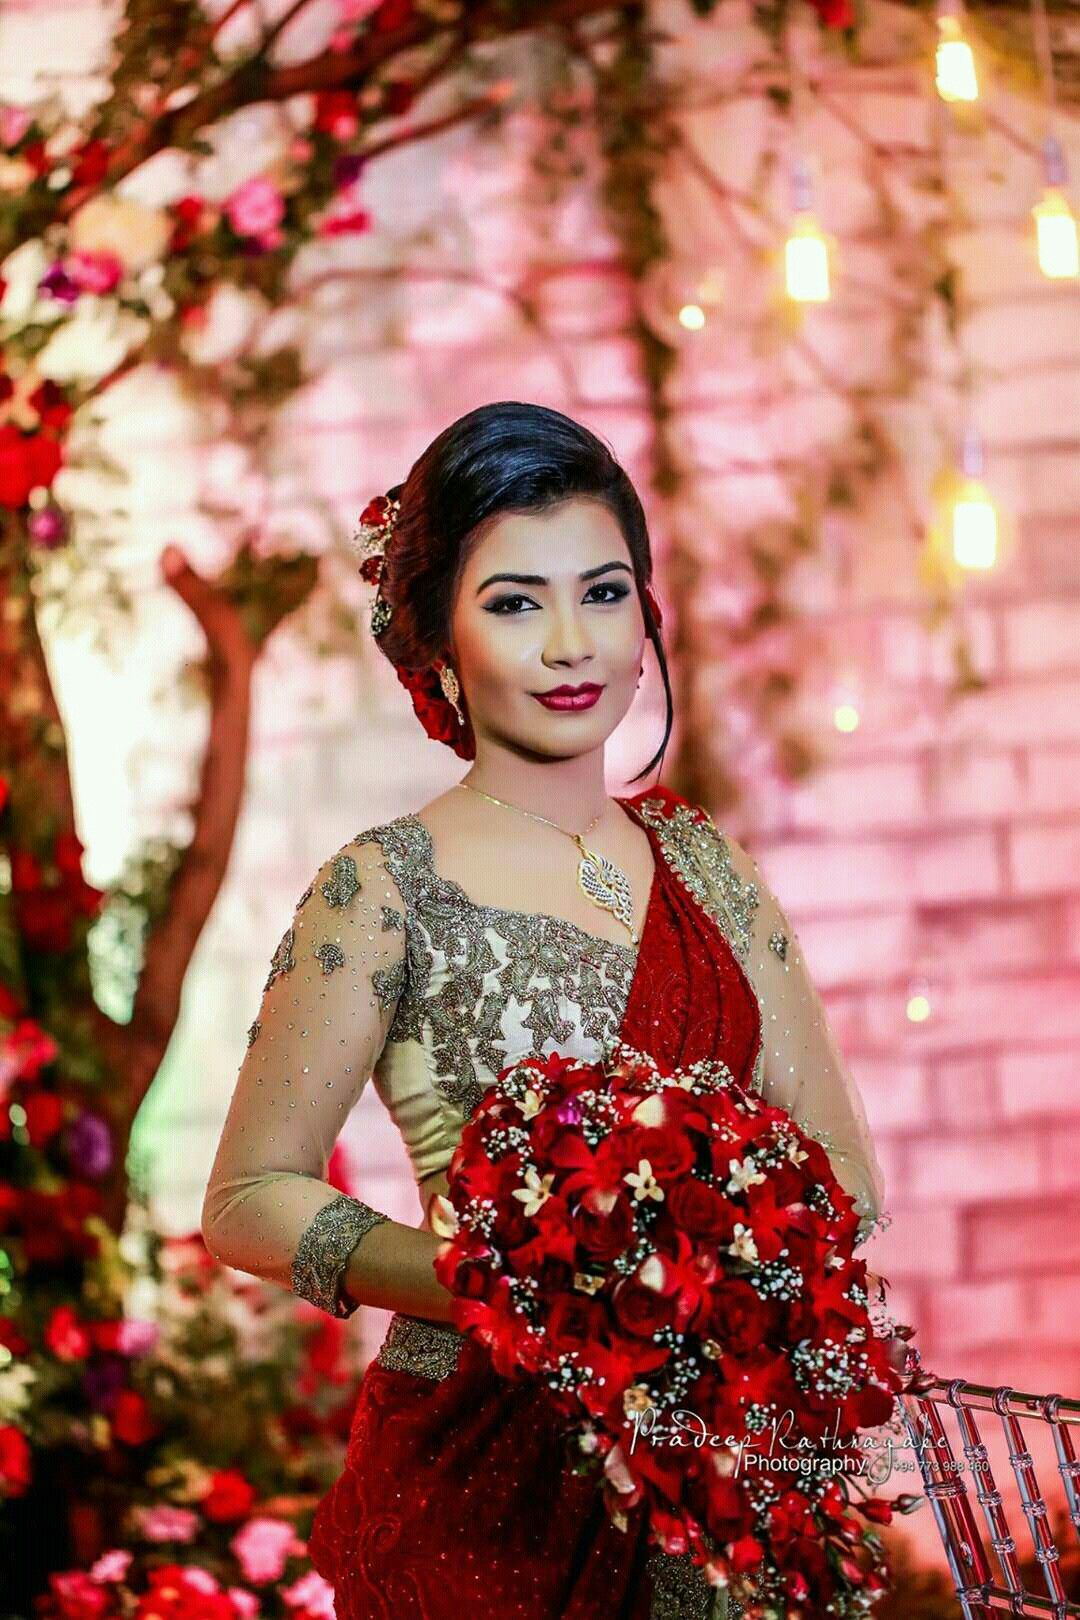 Pin by Yashodara Rathnathilaka on 2nd day Brides Wedding